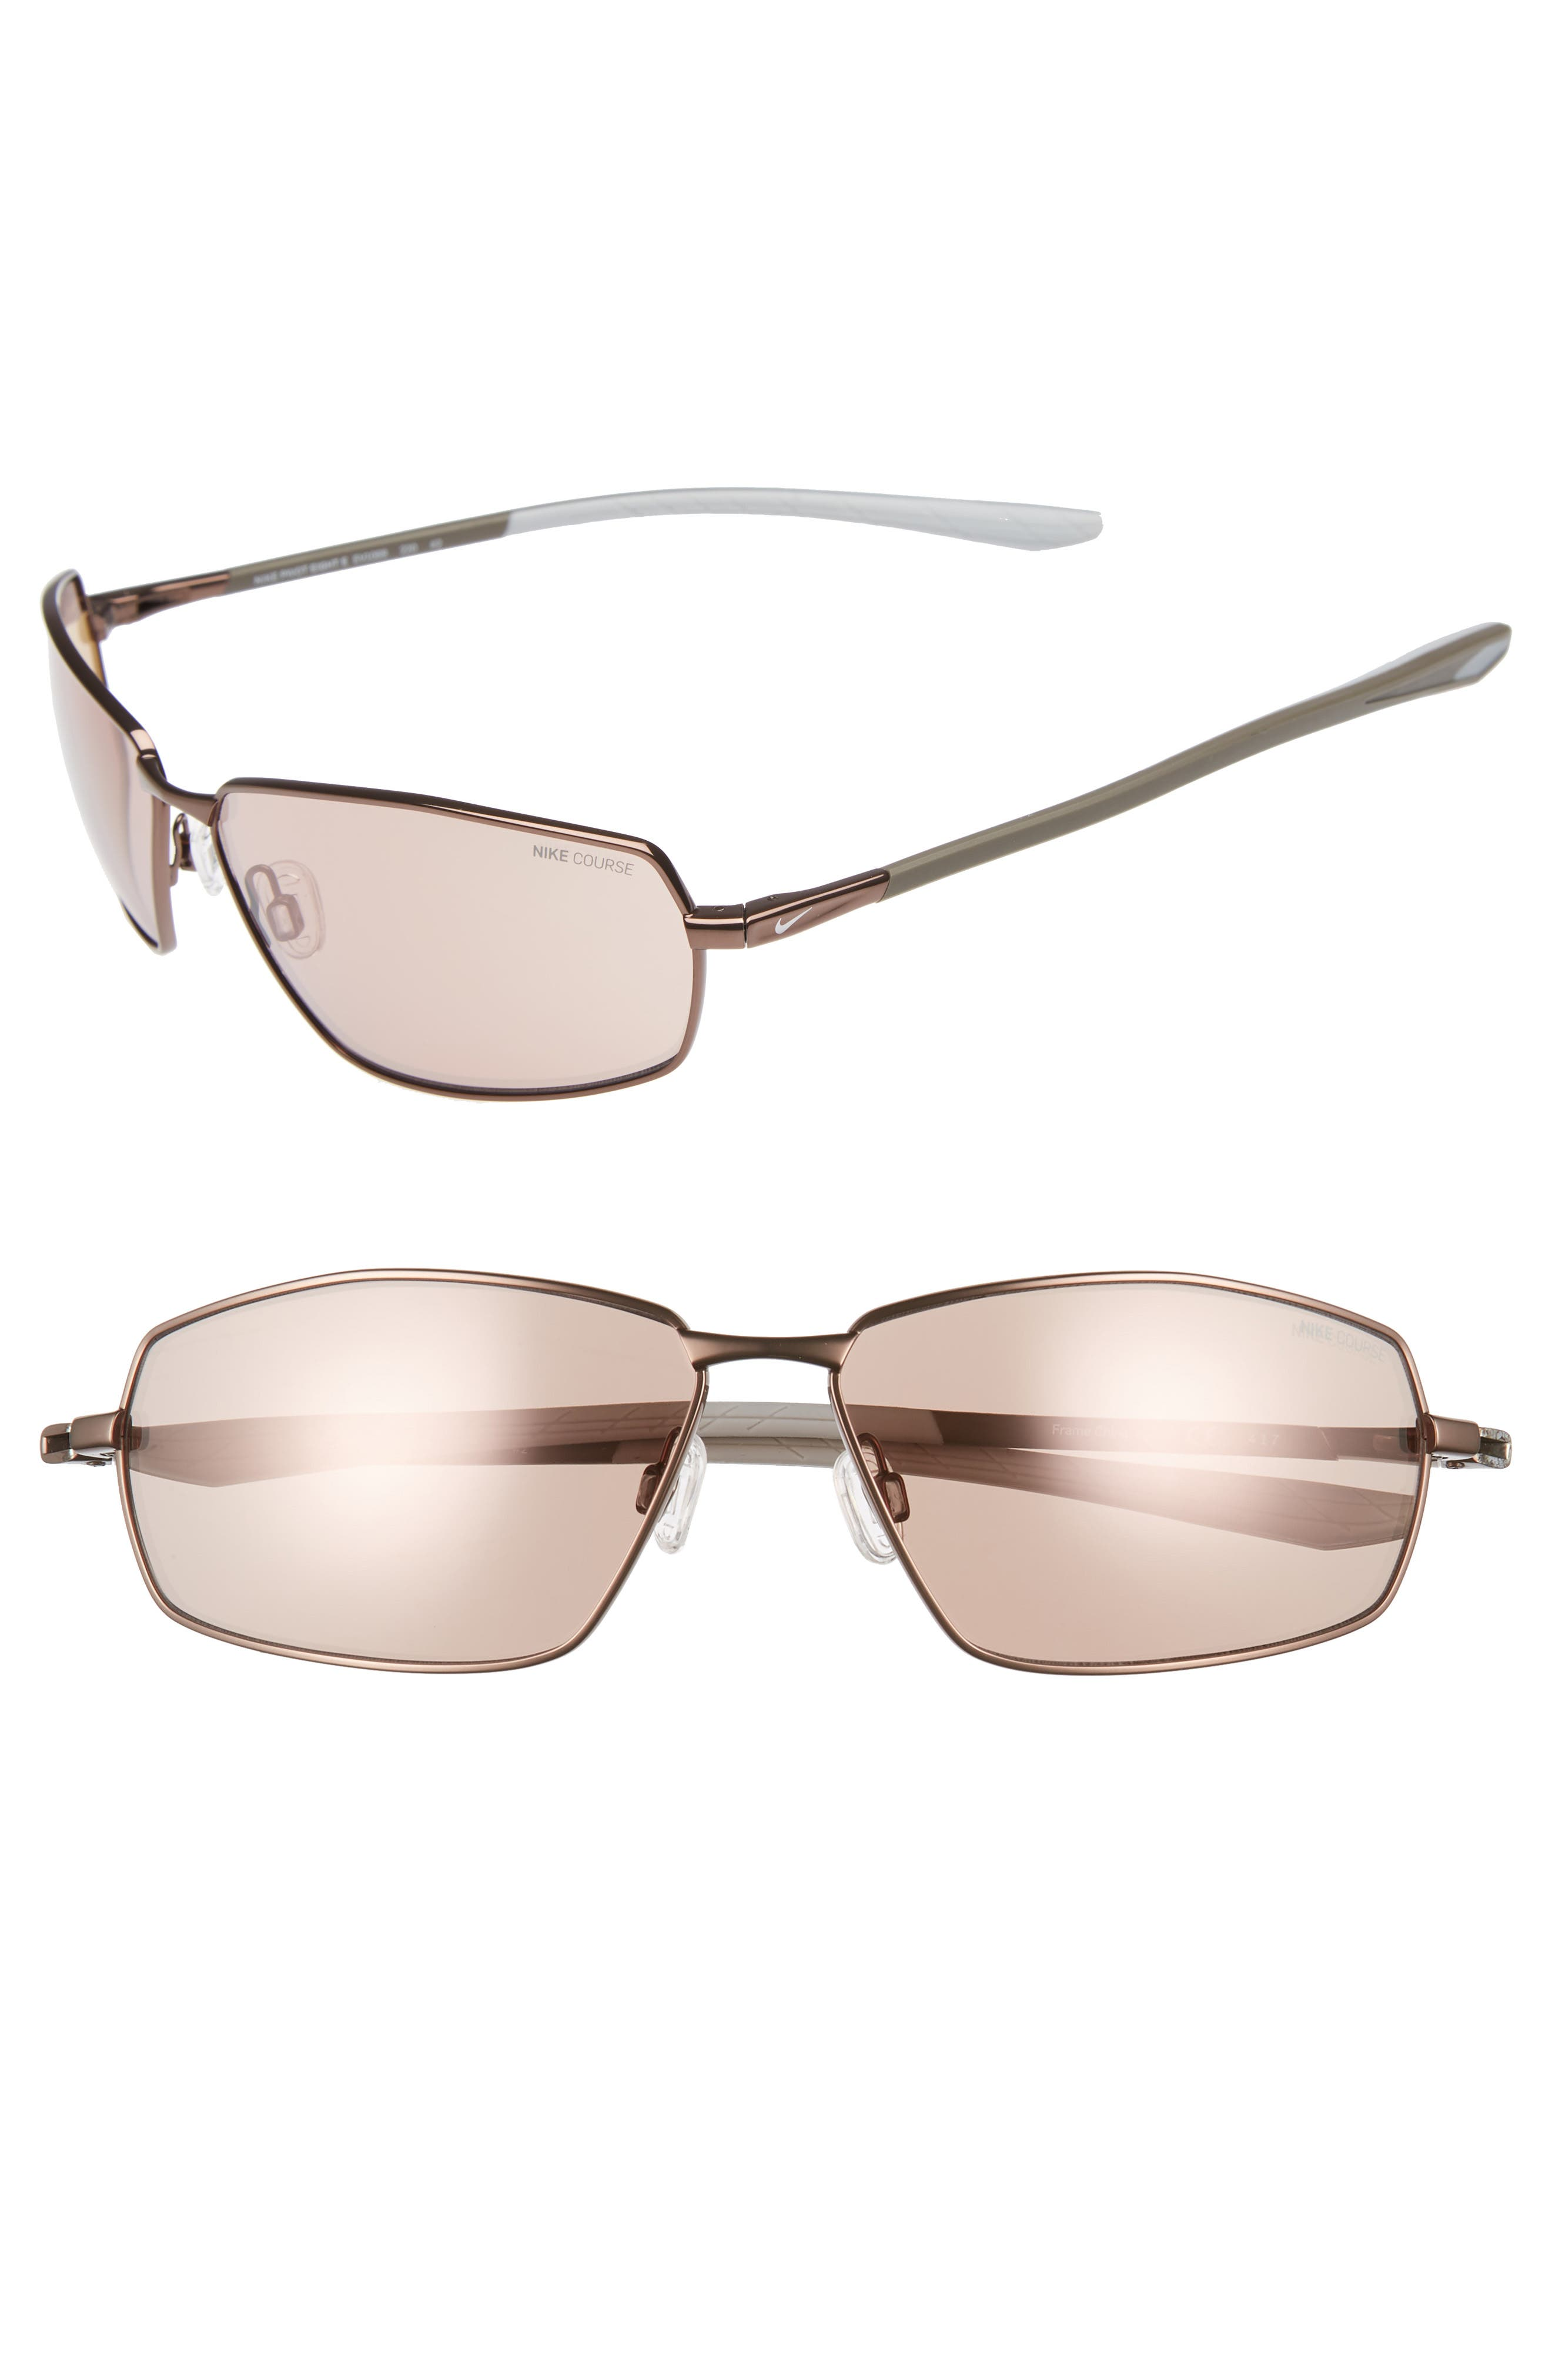 Nike Pivot Eight E 62Mm Oversize Sunglasses - Walnut/ Golf Flash Electric